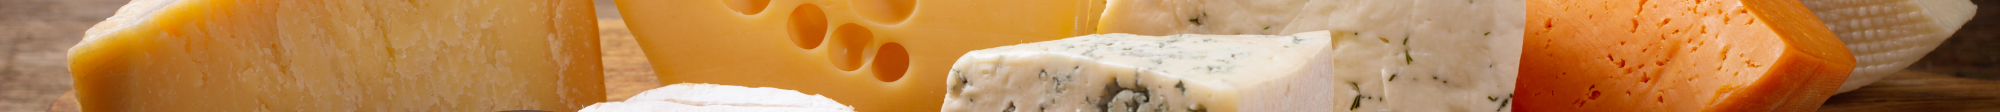 Comprar queso vaca online gourmet   Mixtura Gourmet